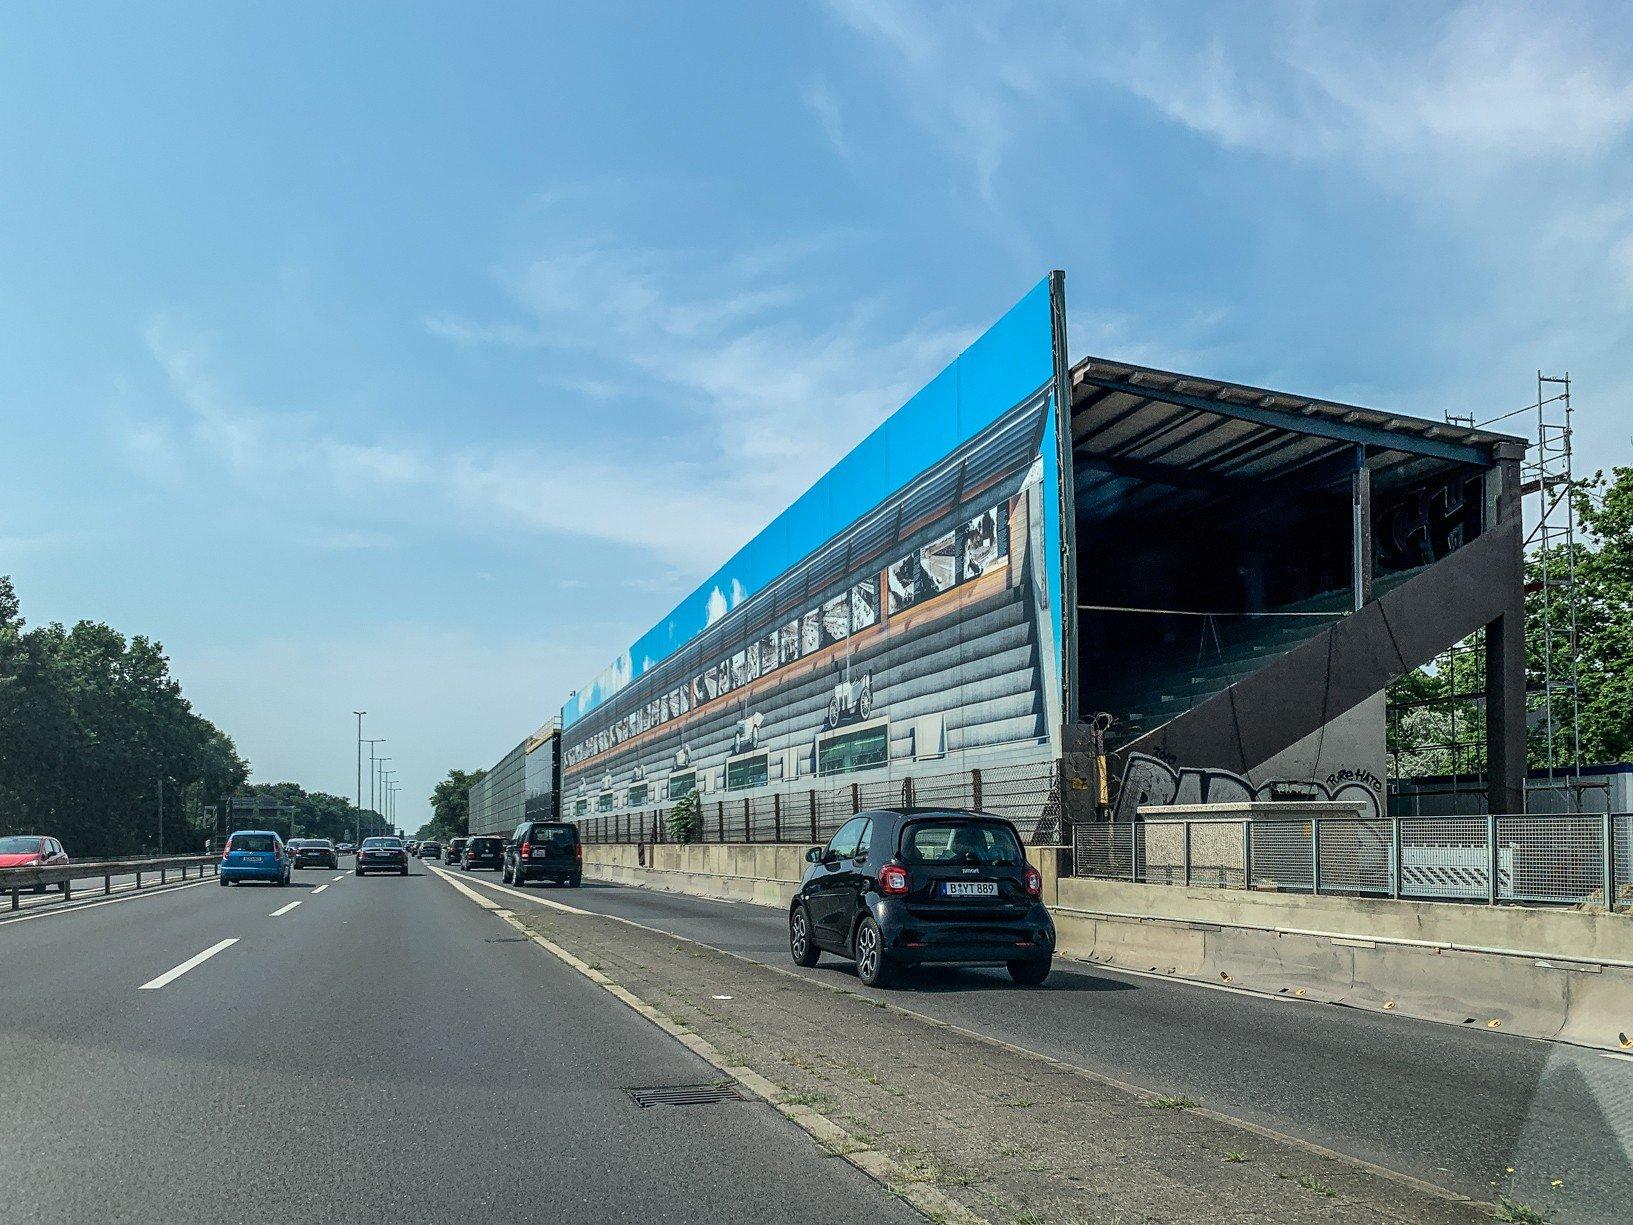 avus tribüne berlin 2021 renovierung autobahn